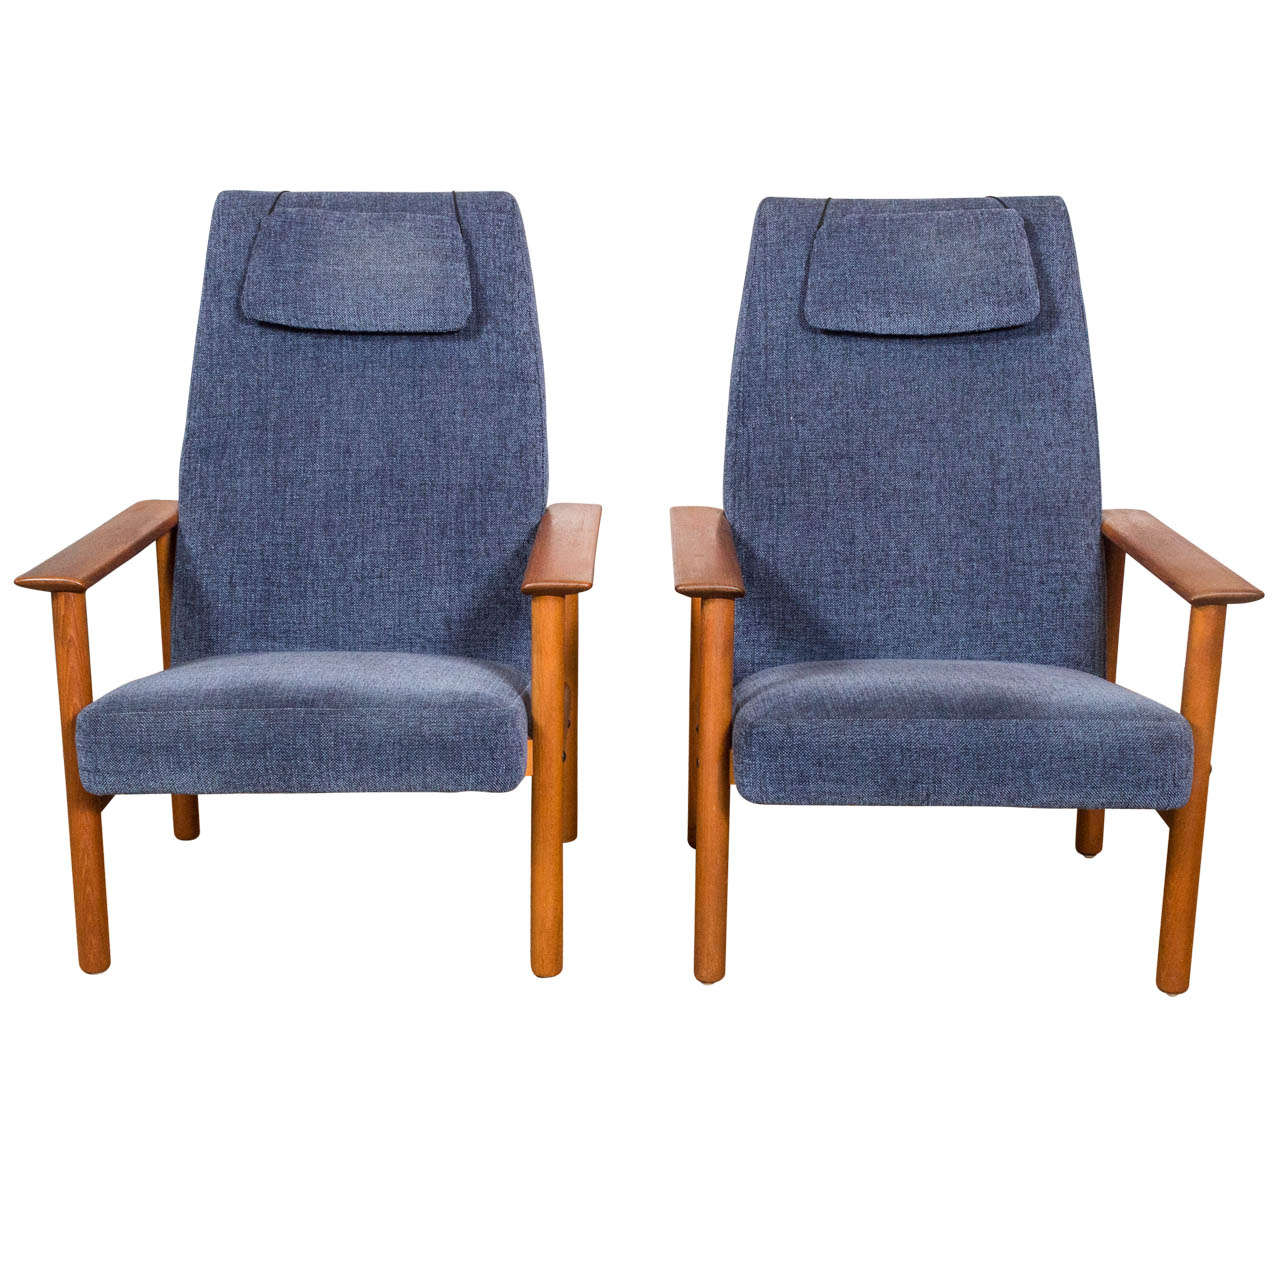 1960s Danish Modern Teak Lounge Chairs At 1stdibs